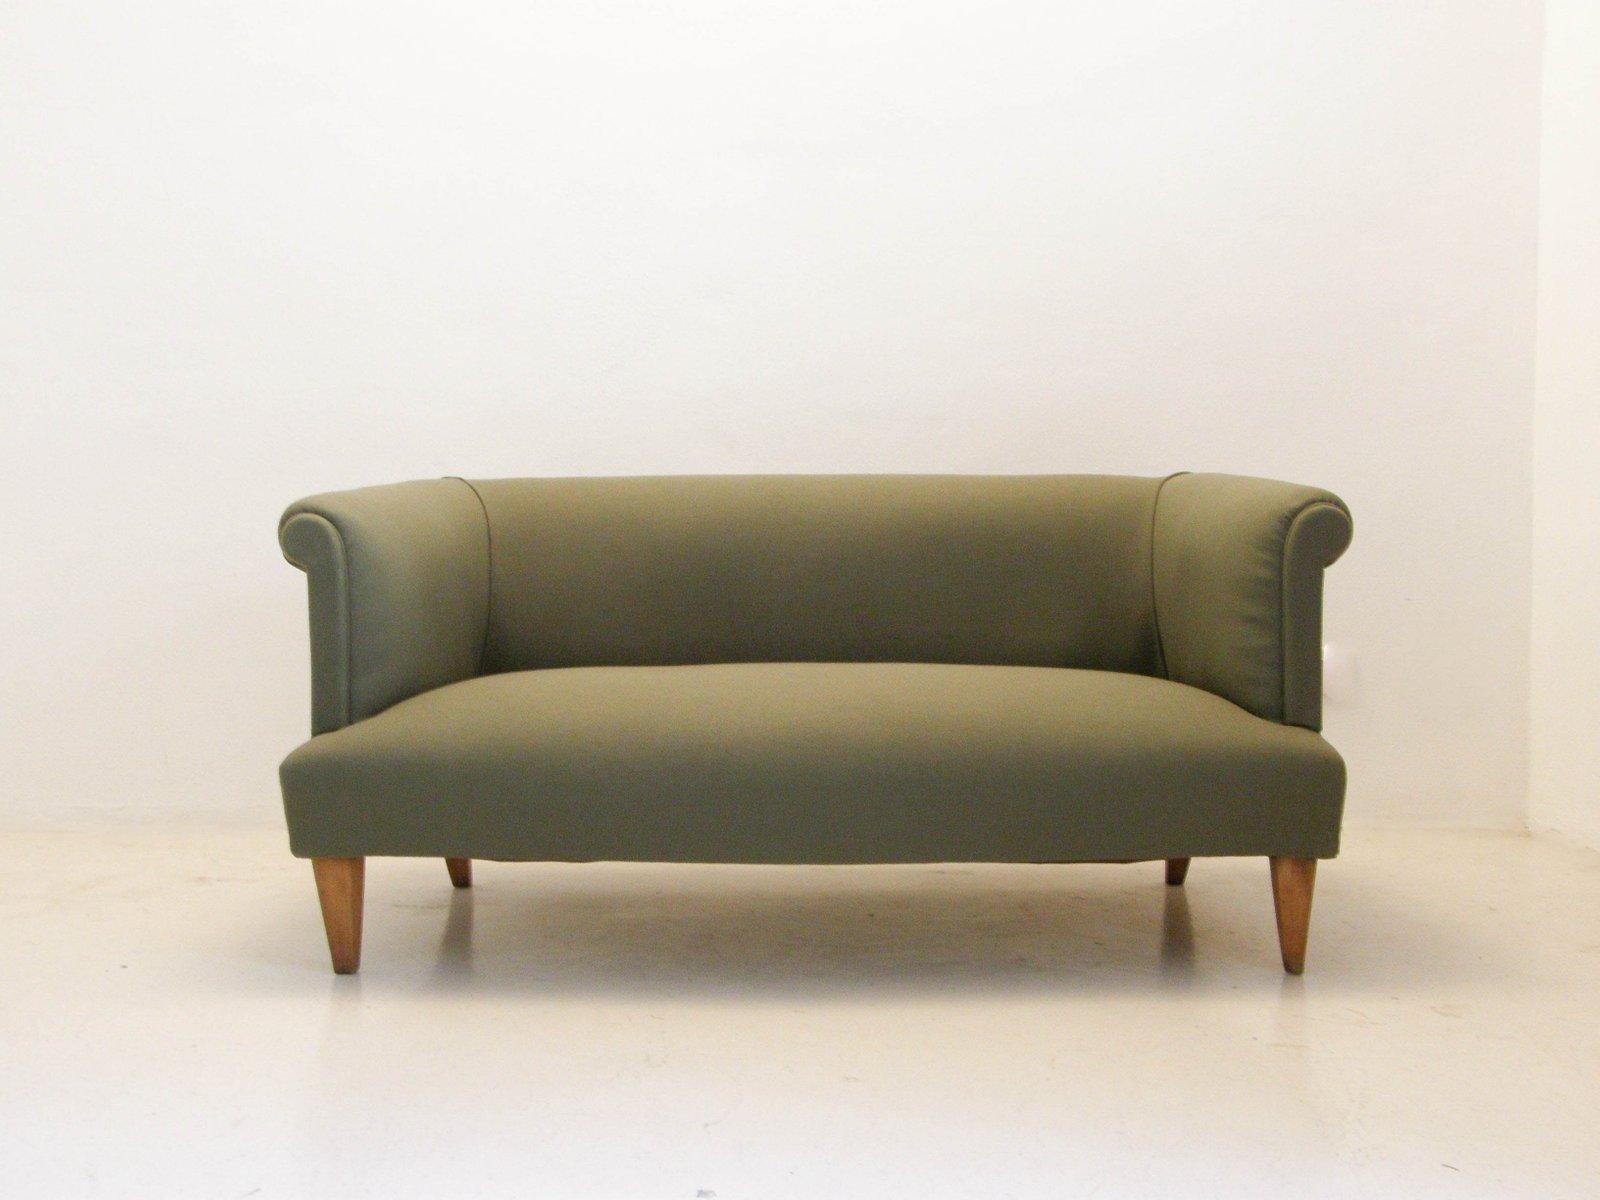 Vintage Little Italian Sofa 1940s For Sale At Pamono